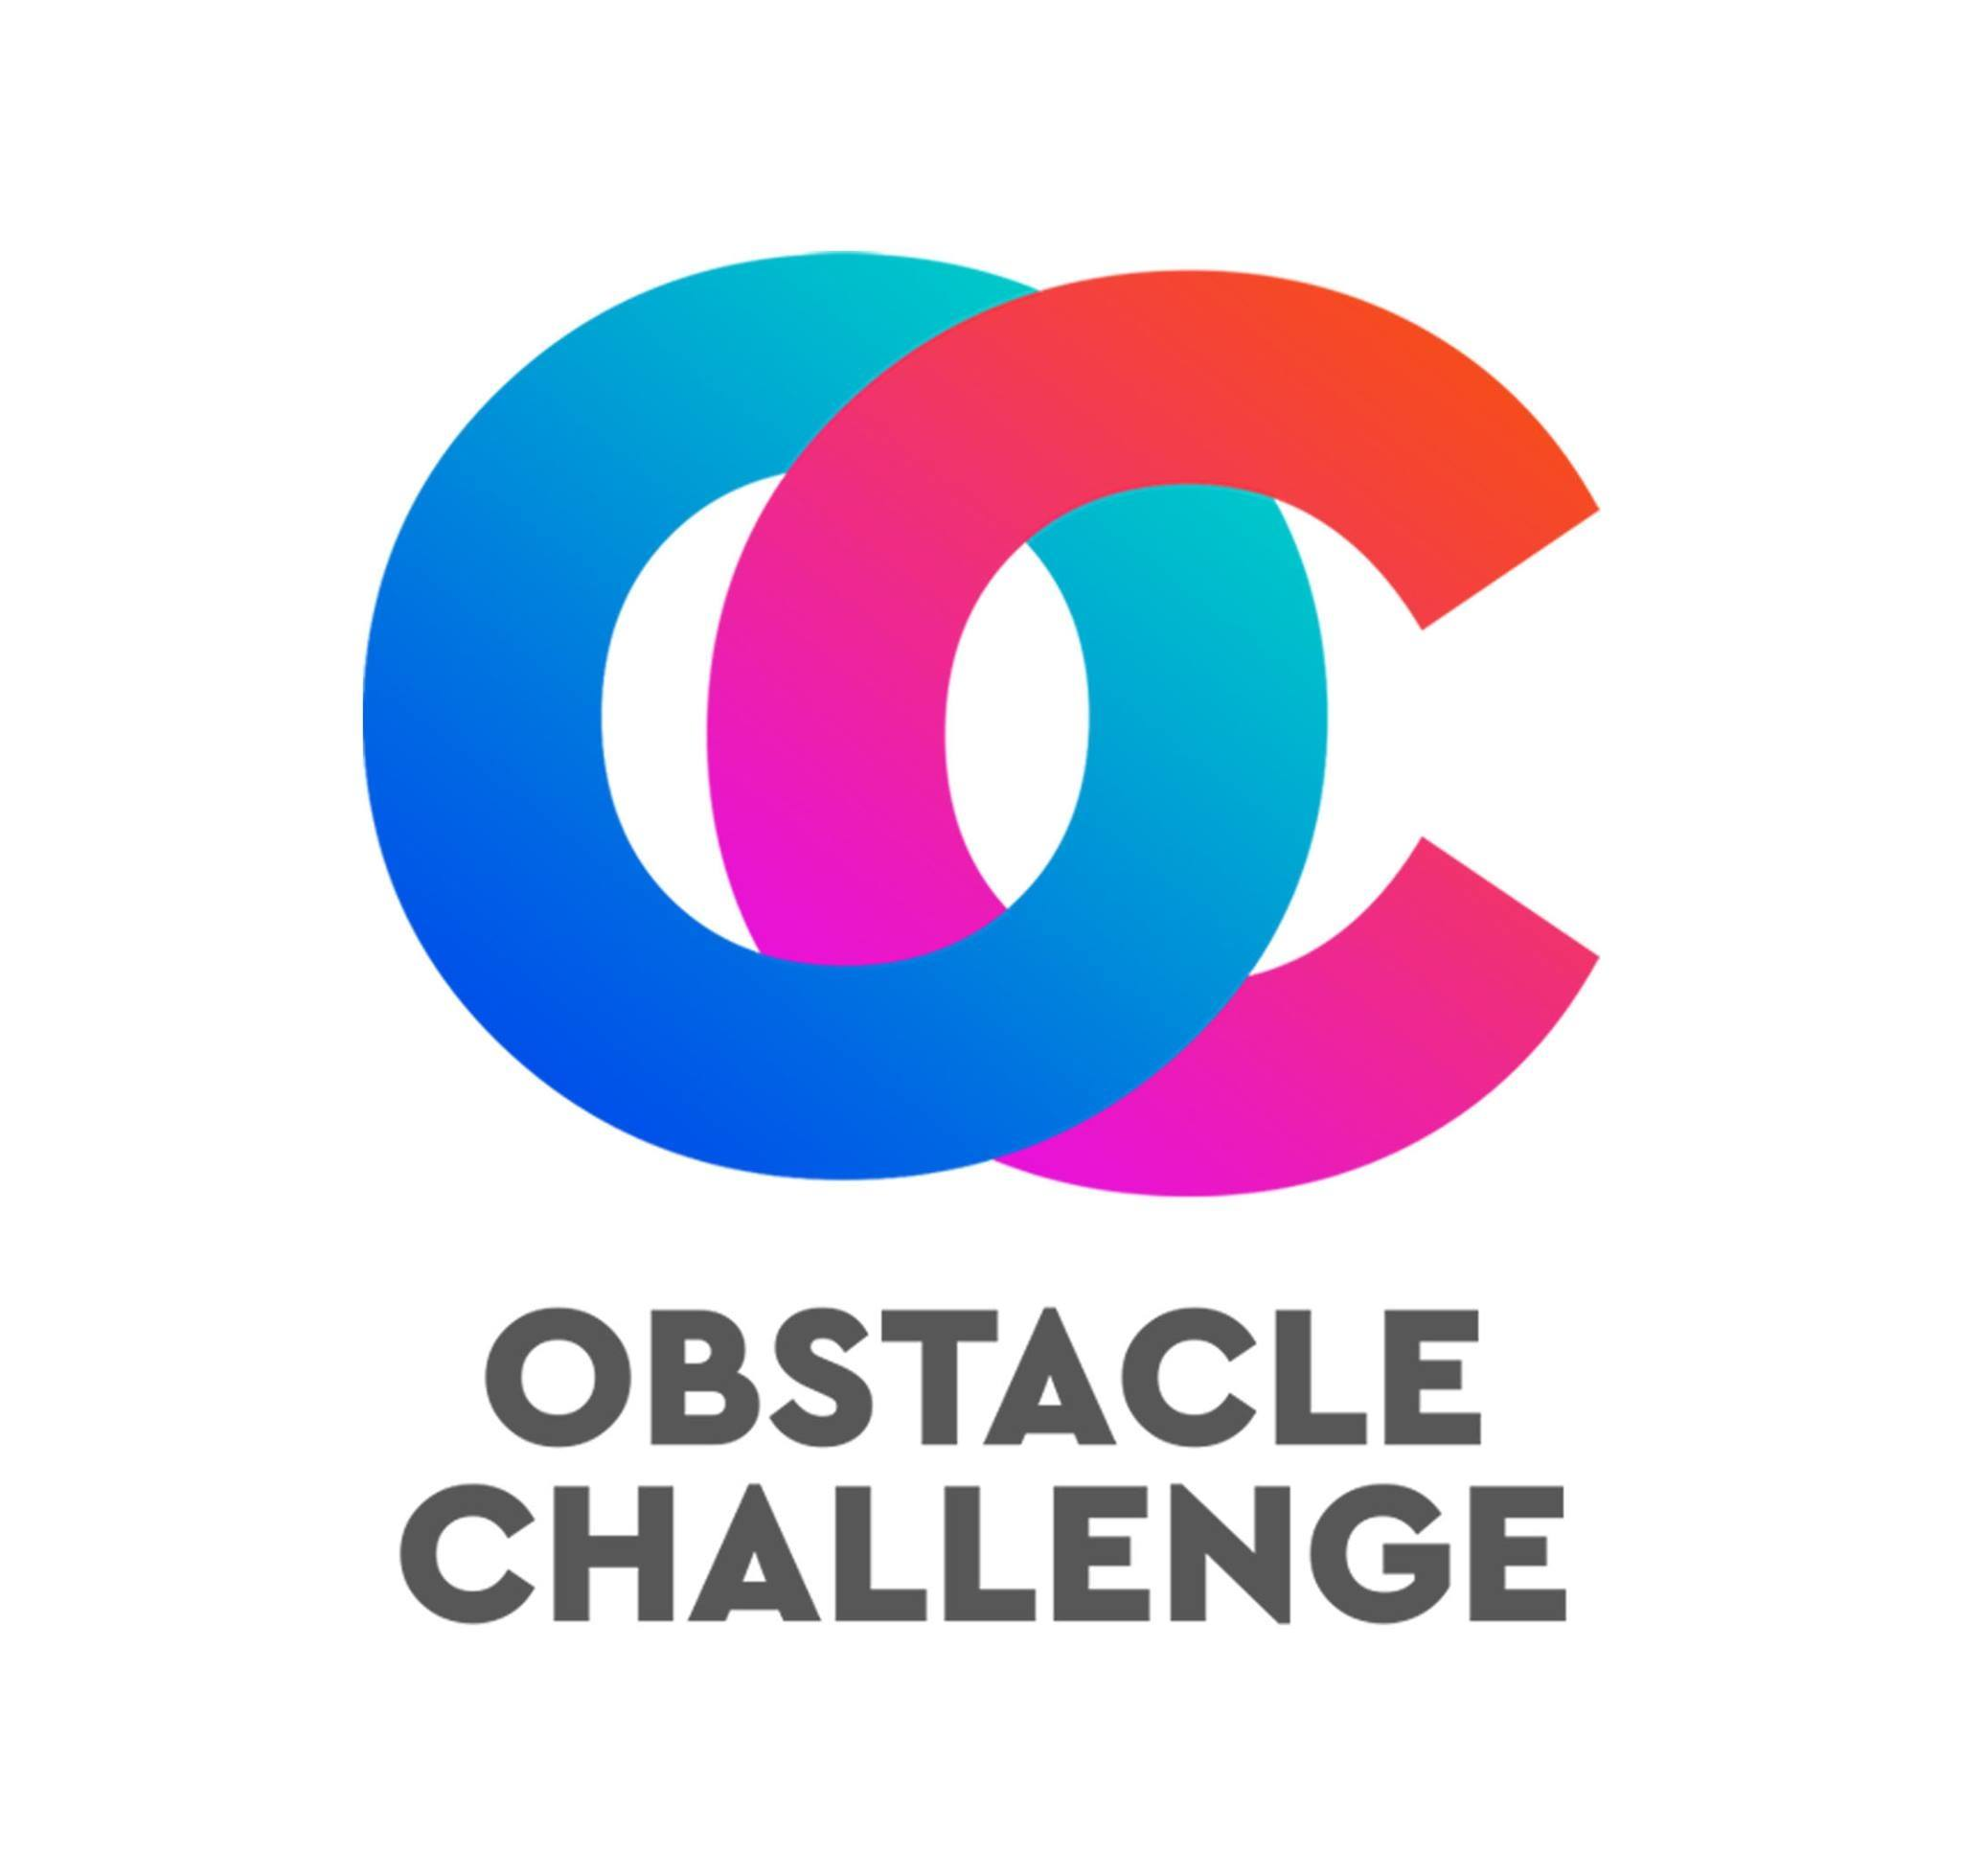 Obstacle Challenge logo